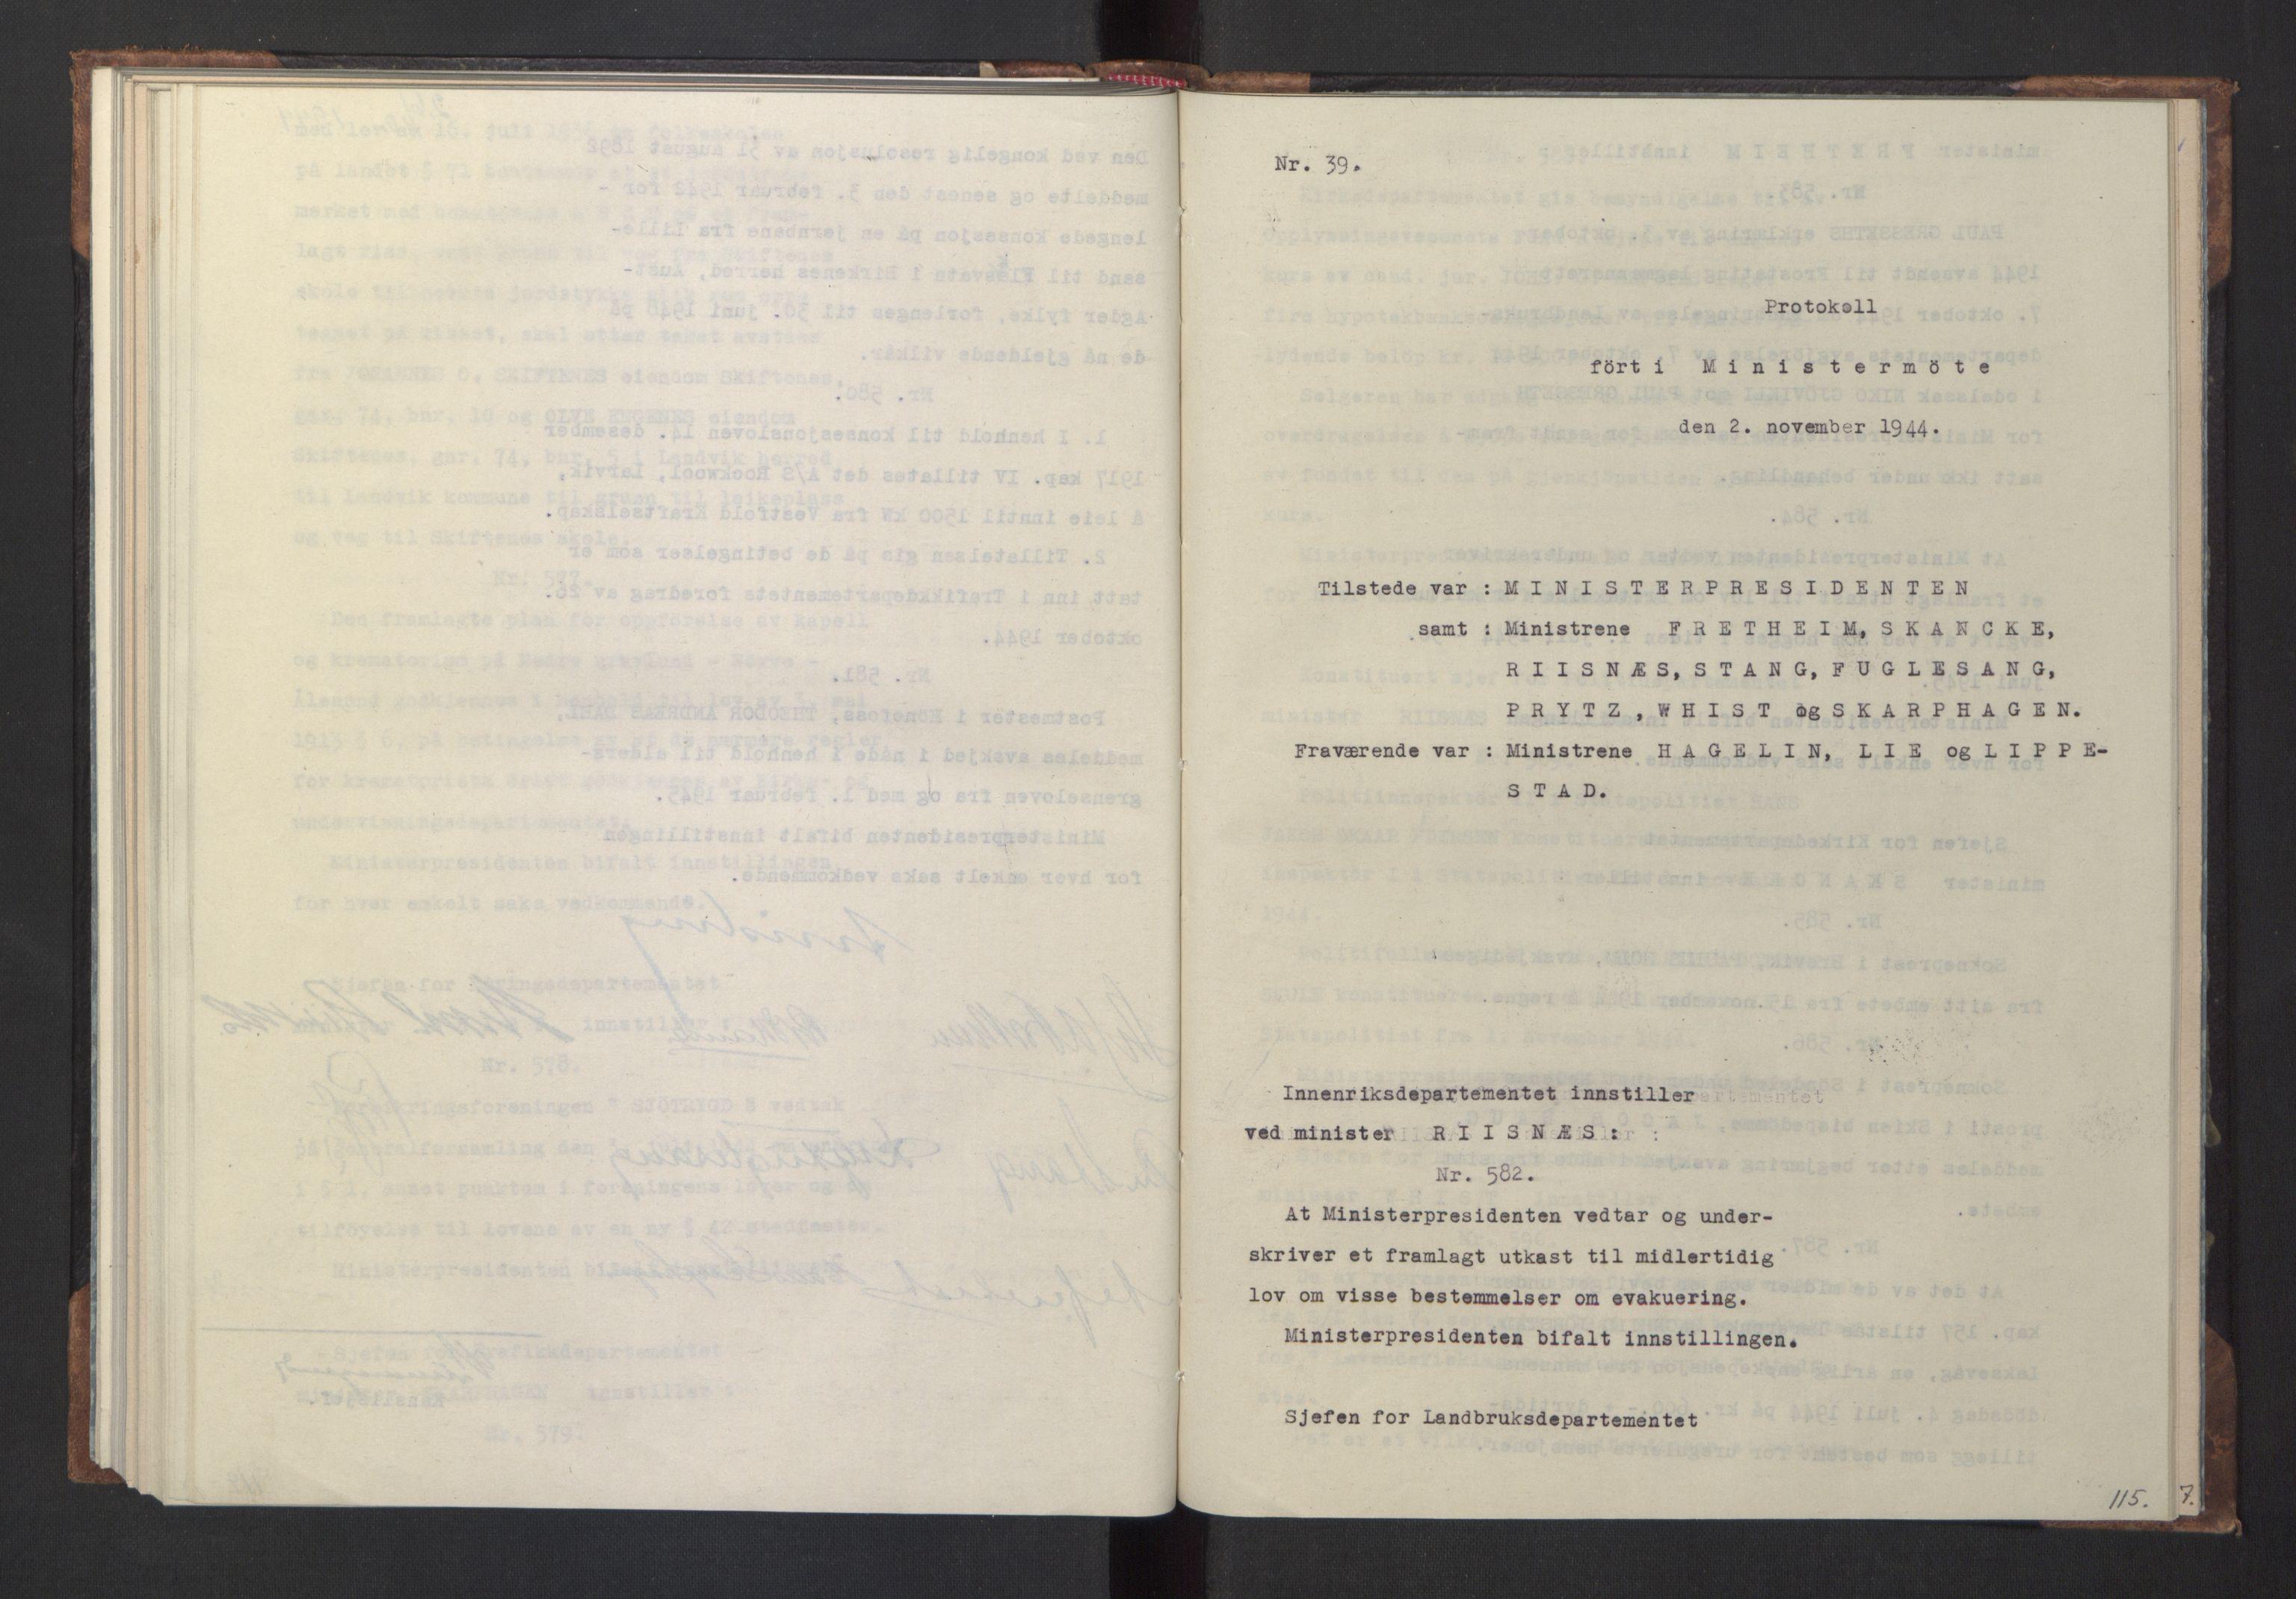 RA, NS-administrasjonen 1940-1945 (Statsrådsekretariatet, de kommisariske statsråder mm), D/Da/L0005: Protokoll fra ministermøter, 1944, s. 114b-115a